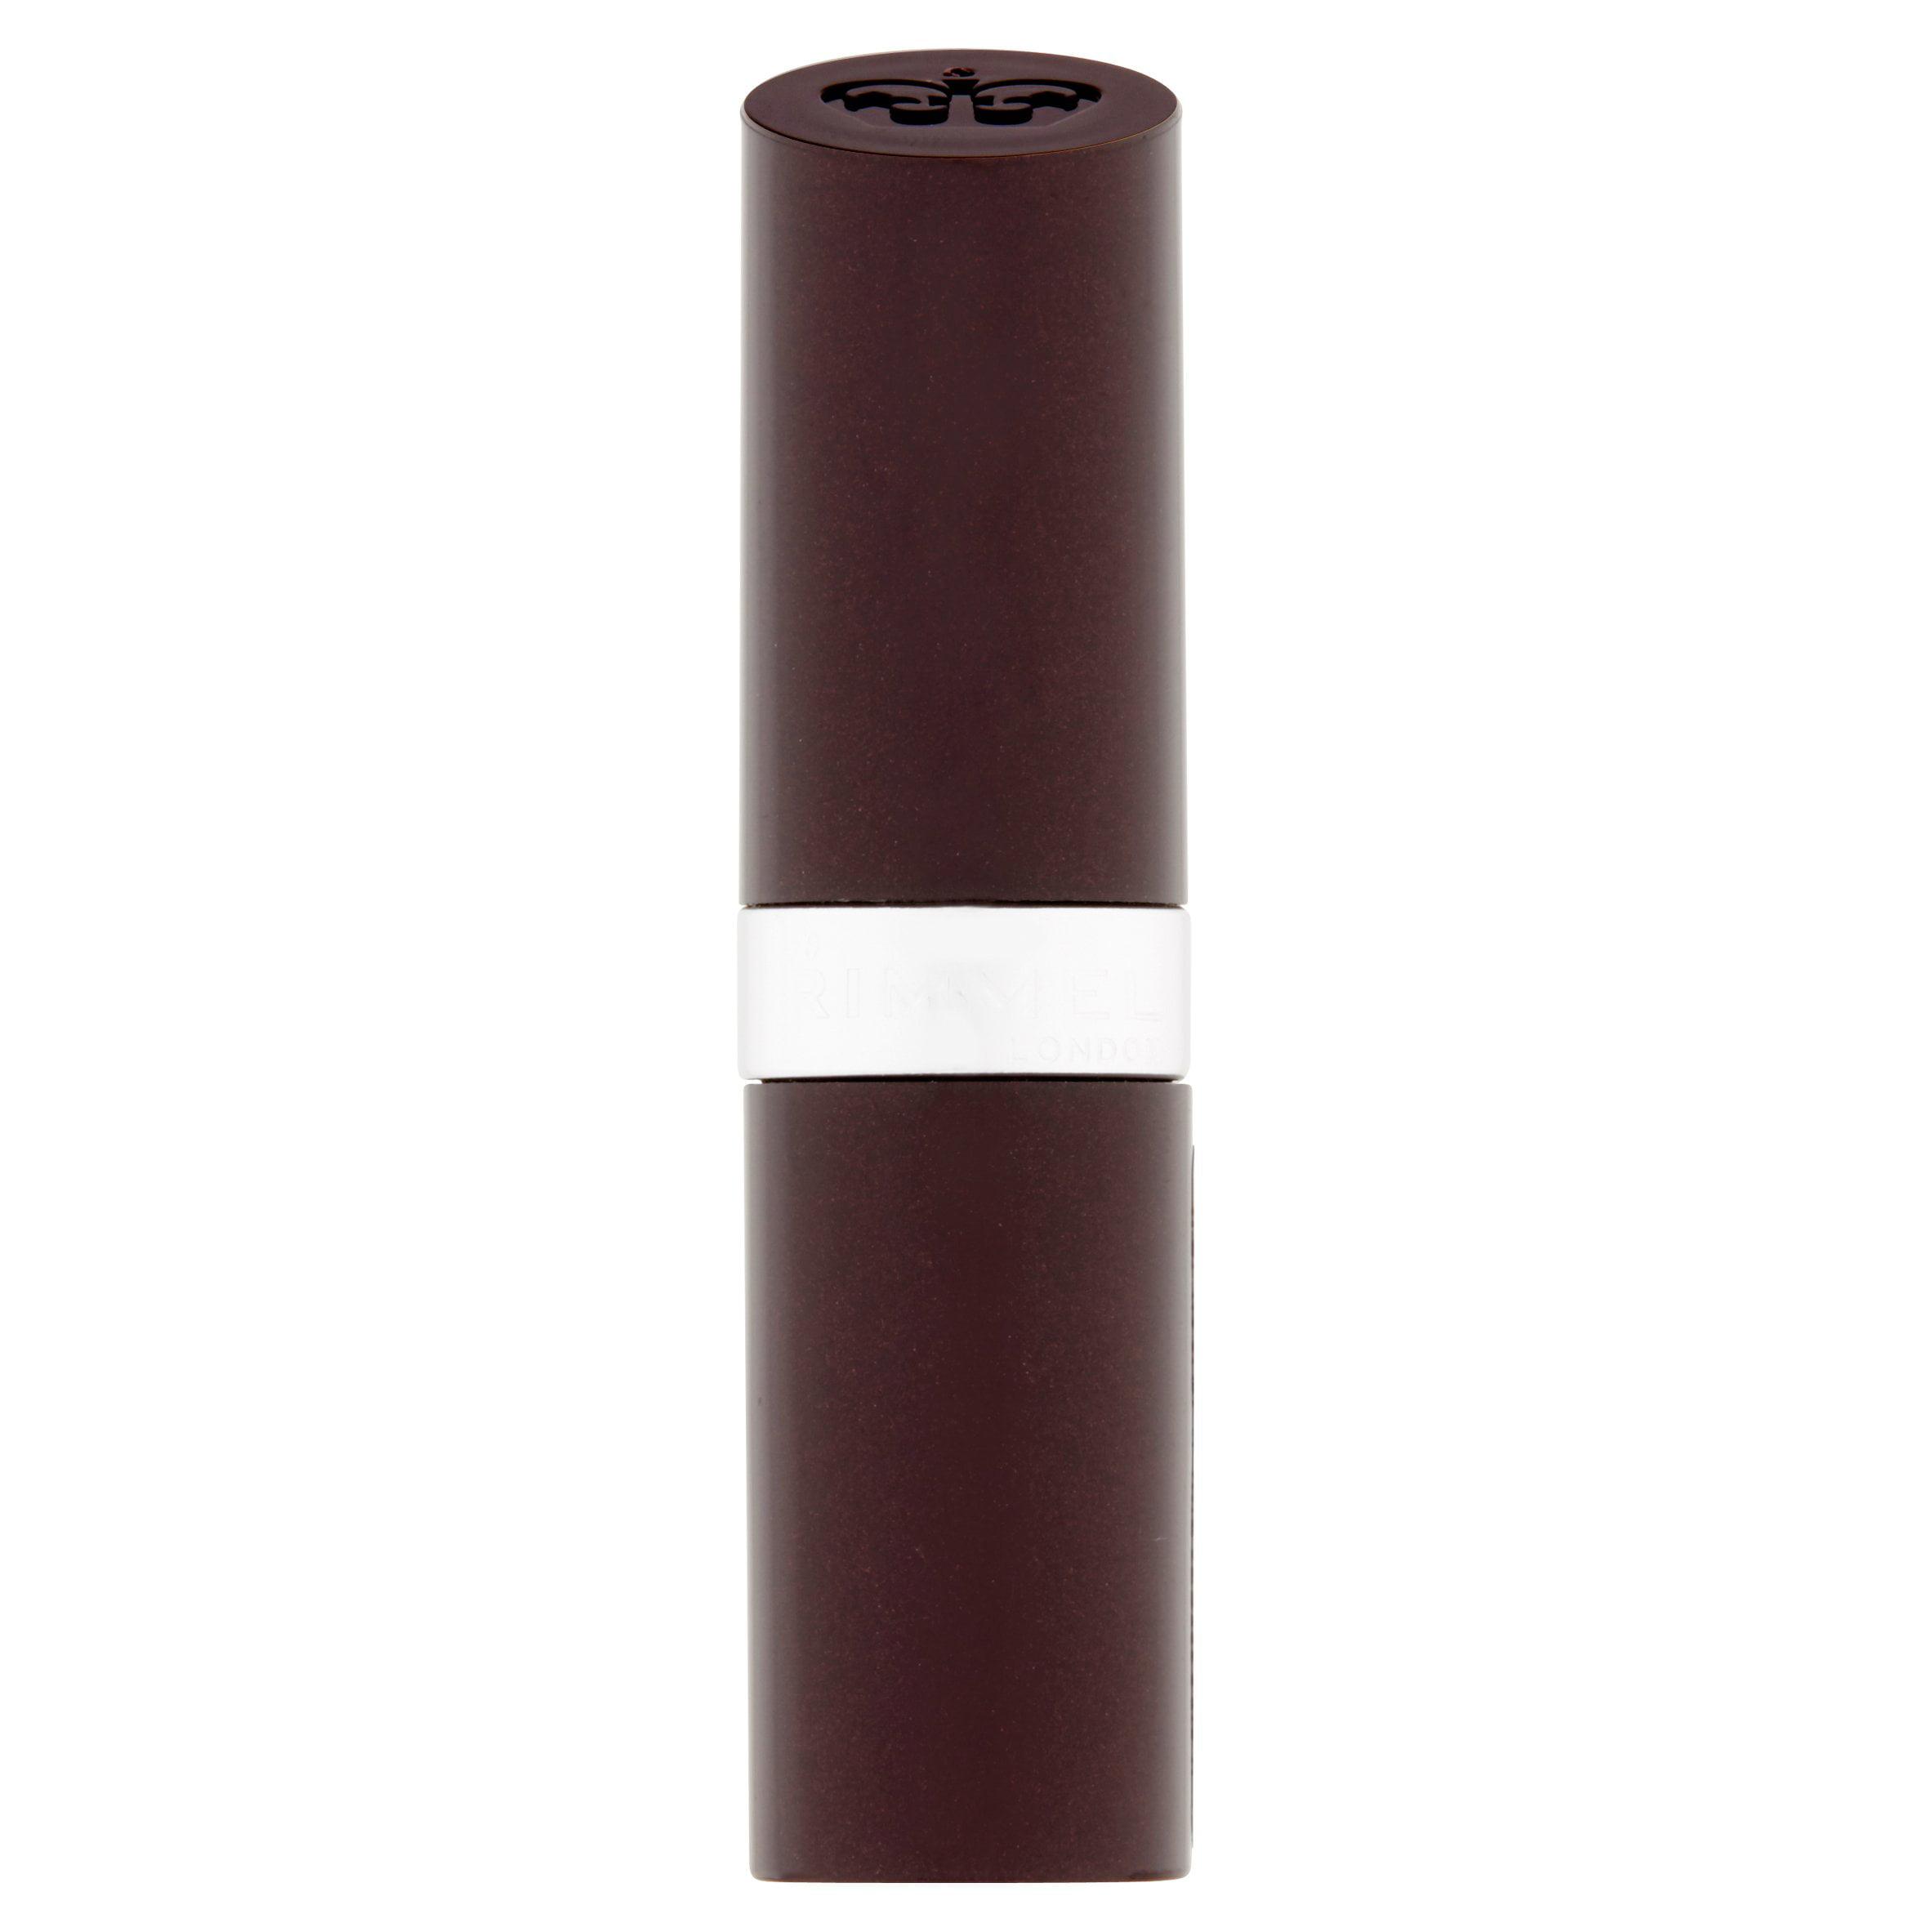 Rimmel Inc. Coty Rimmel London Lasting Finish Lipstick, 170 Alarm, 0.14 Oz